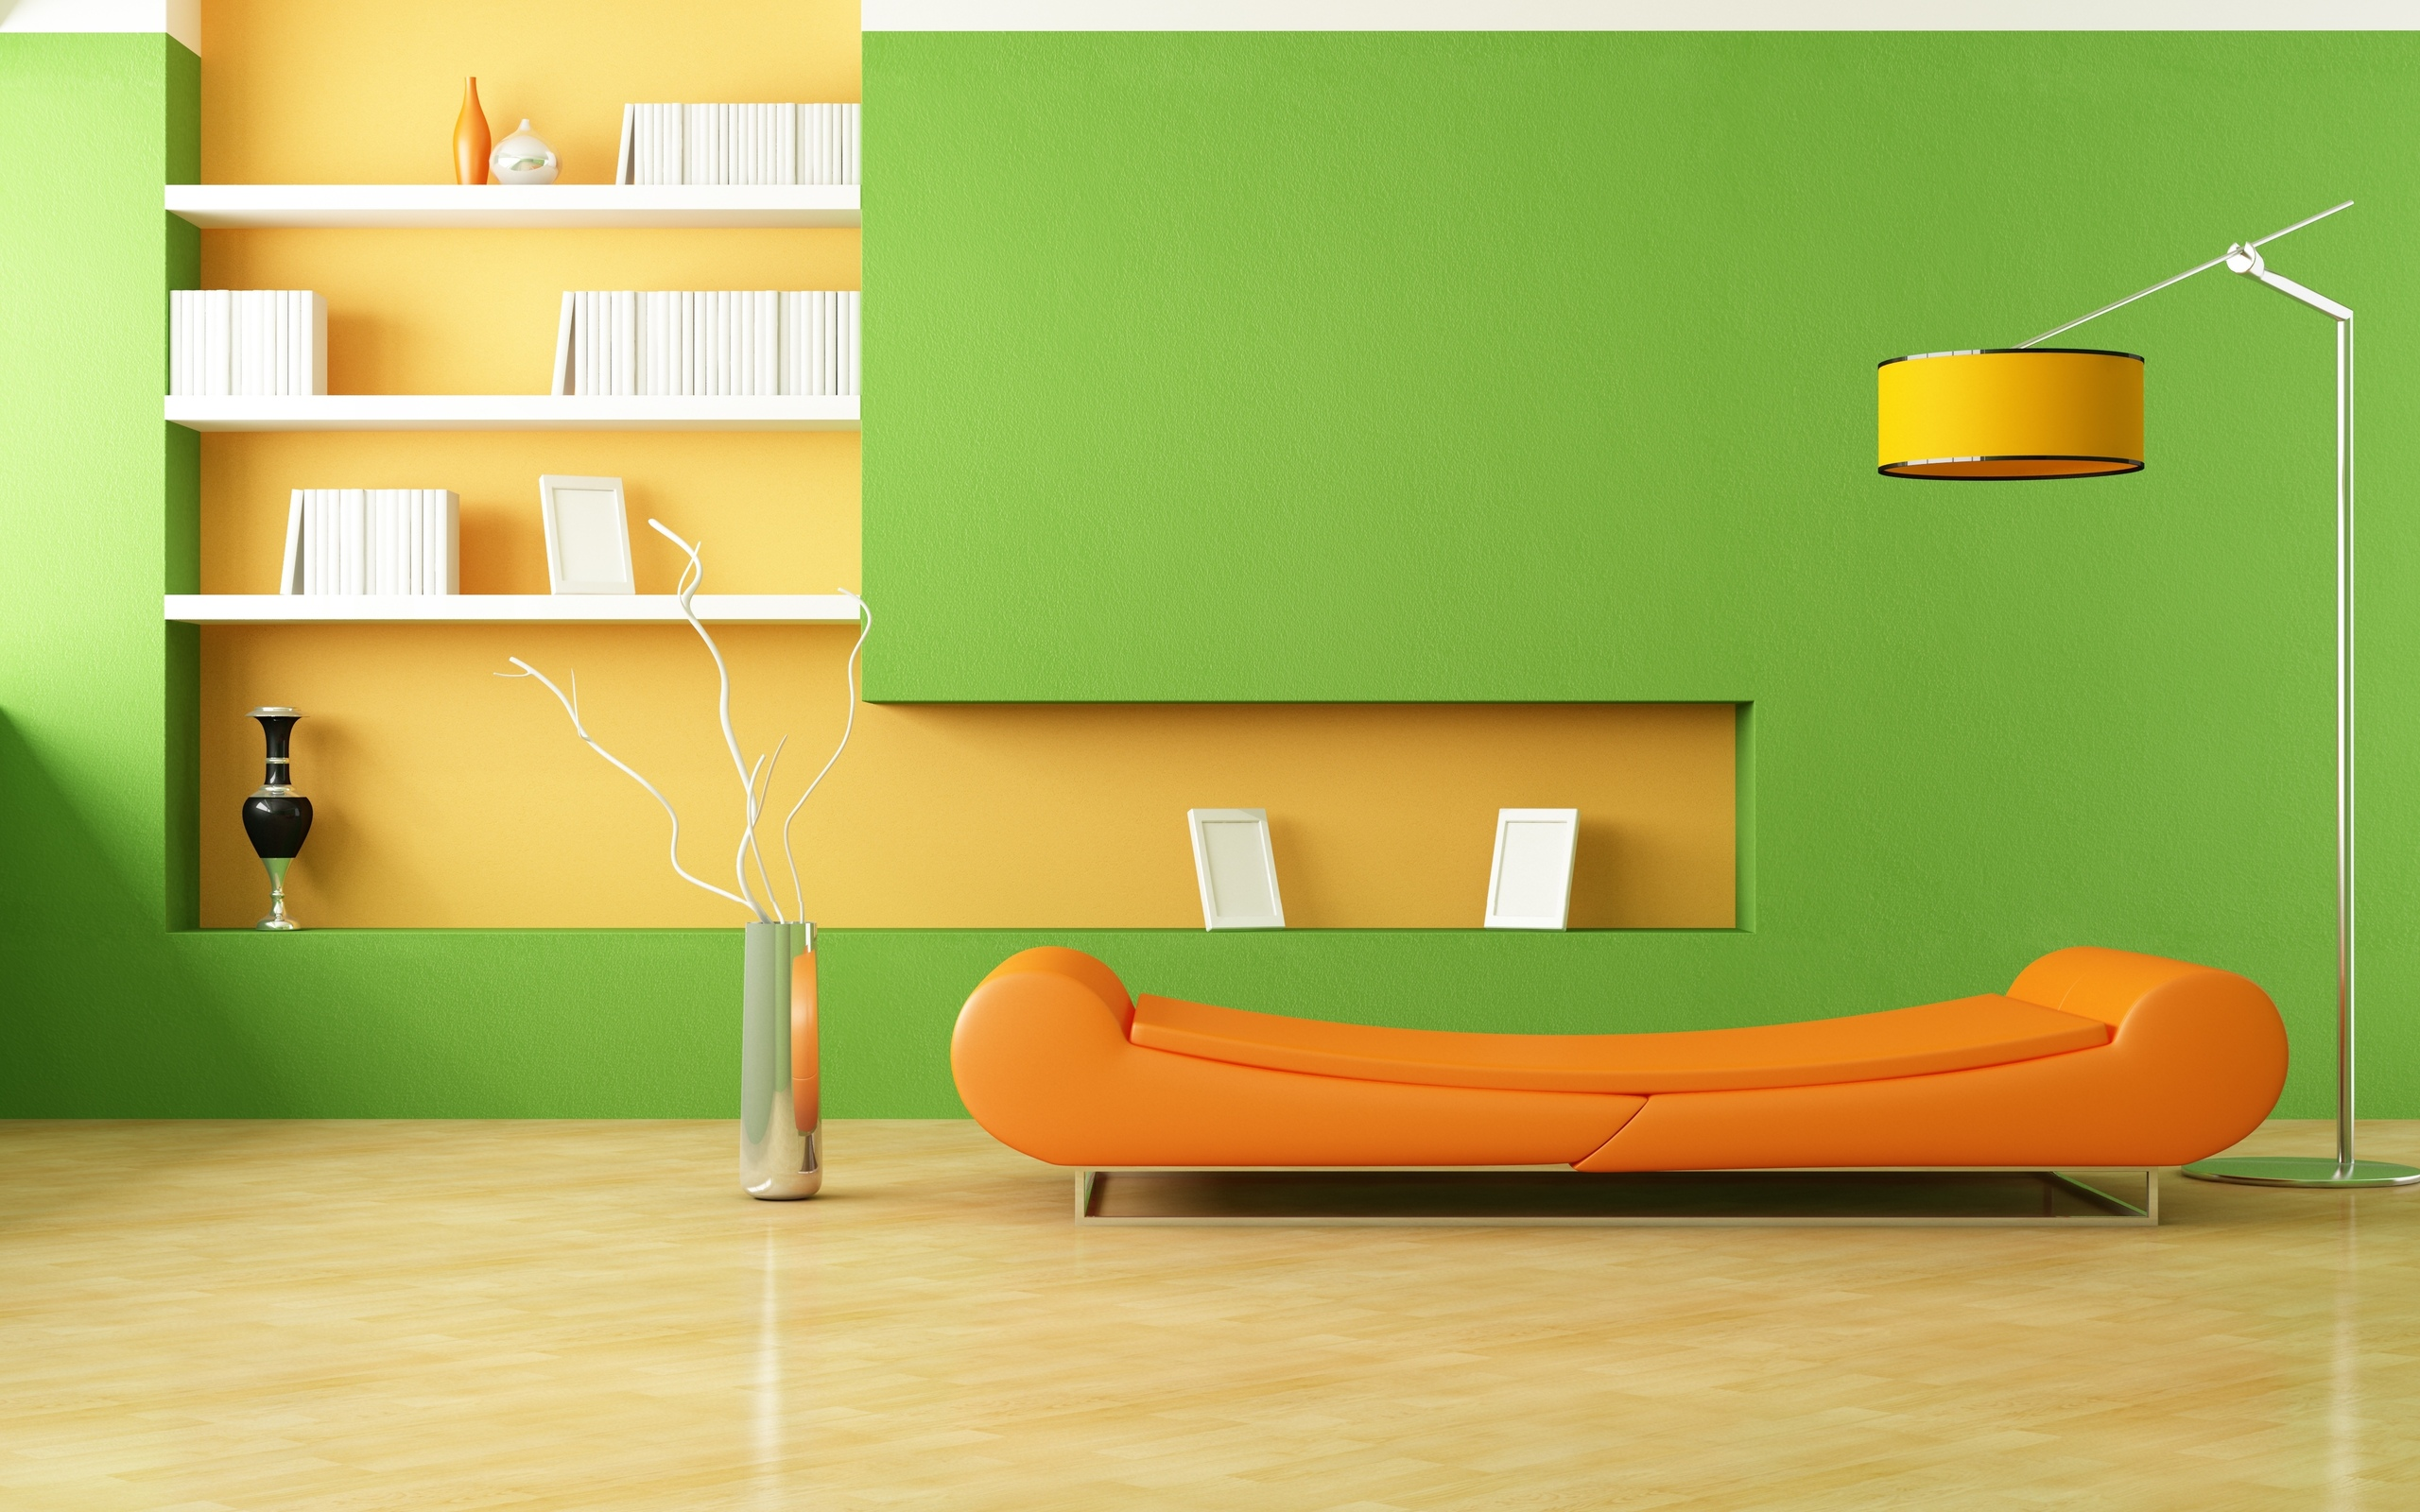 Design Sofa Minimalism Style Room Interior Furniture